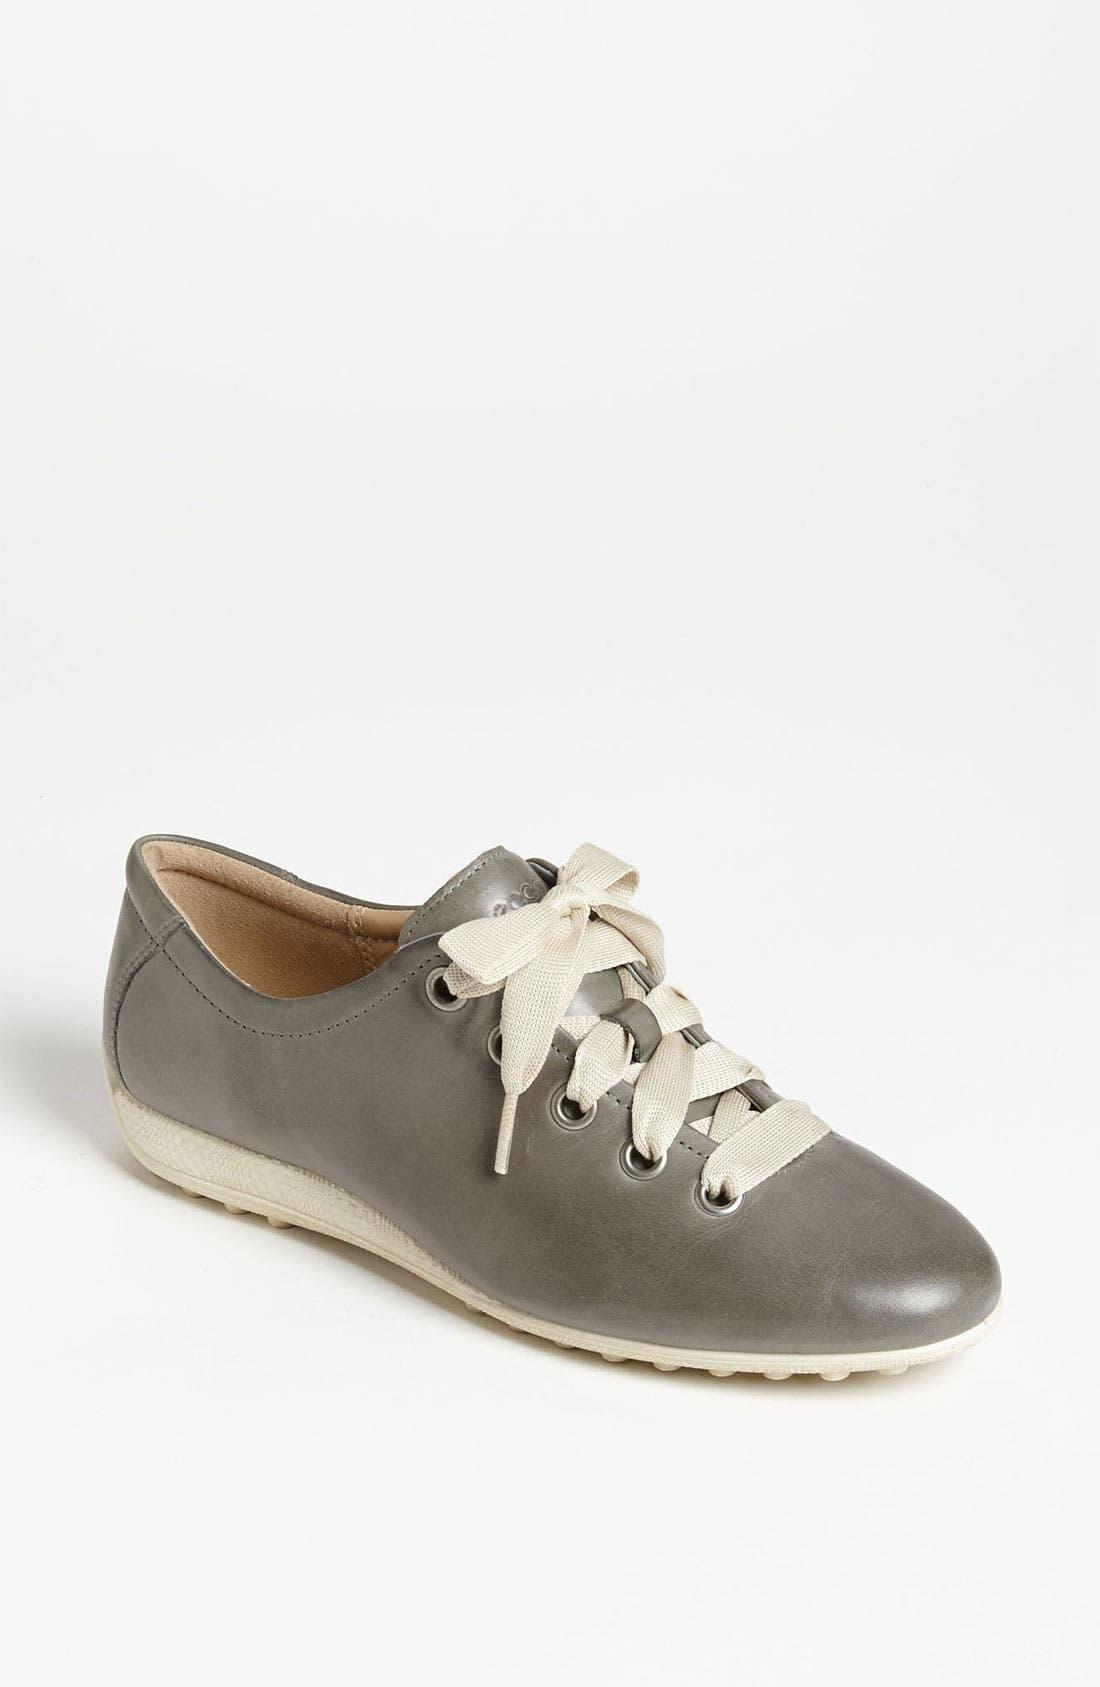 Alternate Image 1 Selected - ECCO 'Frill Tie' Shoe